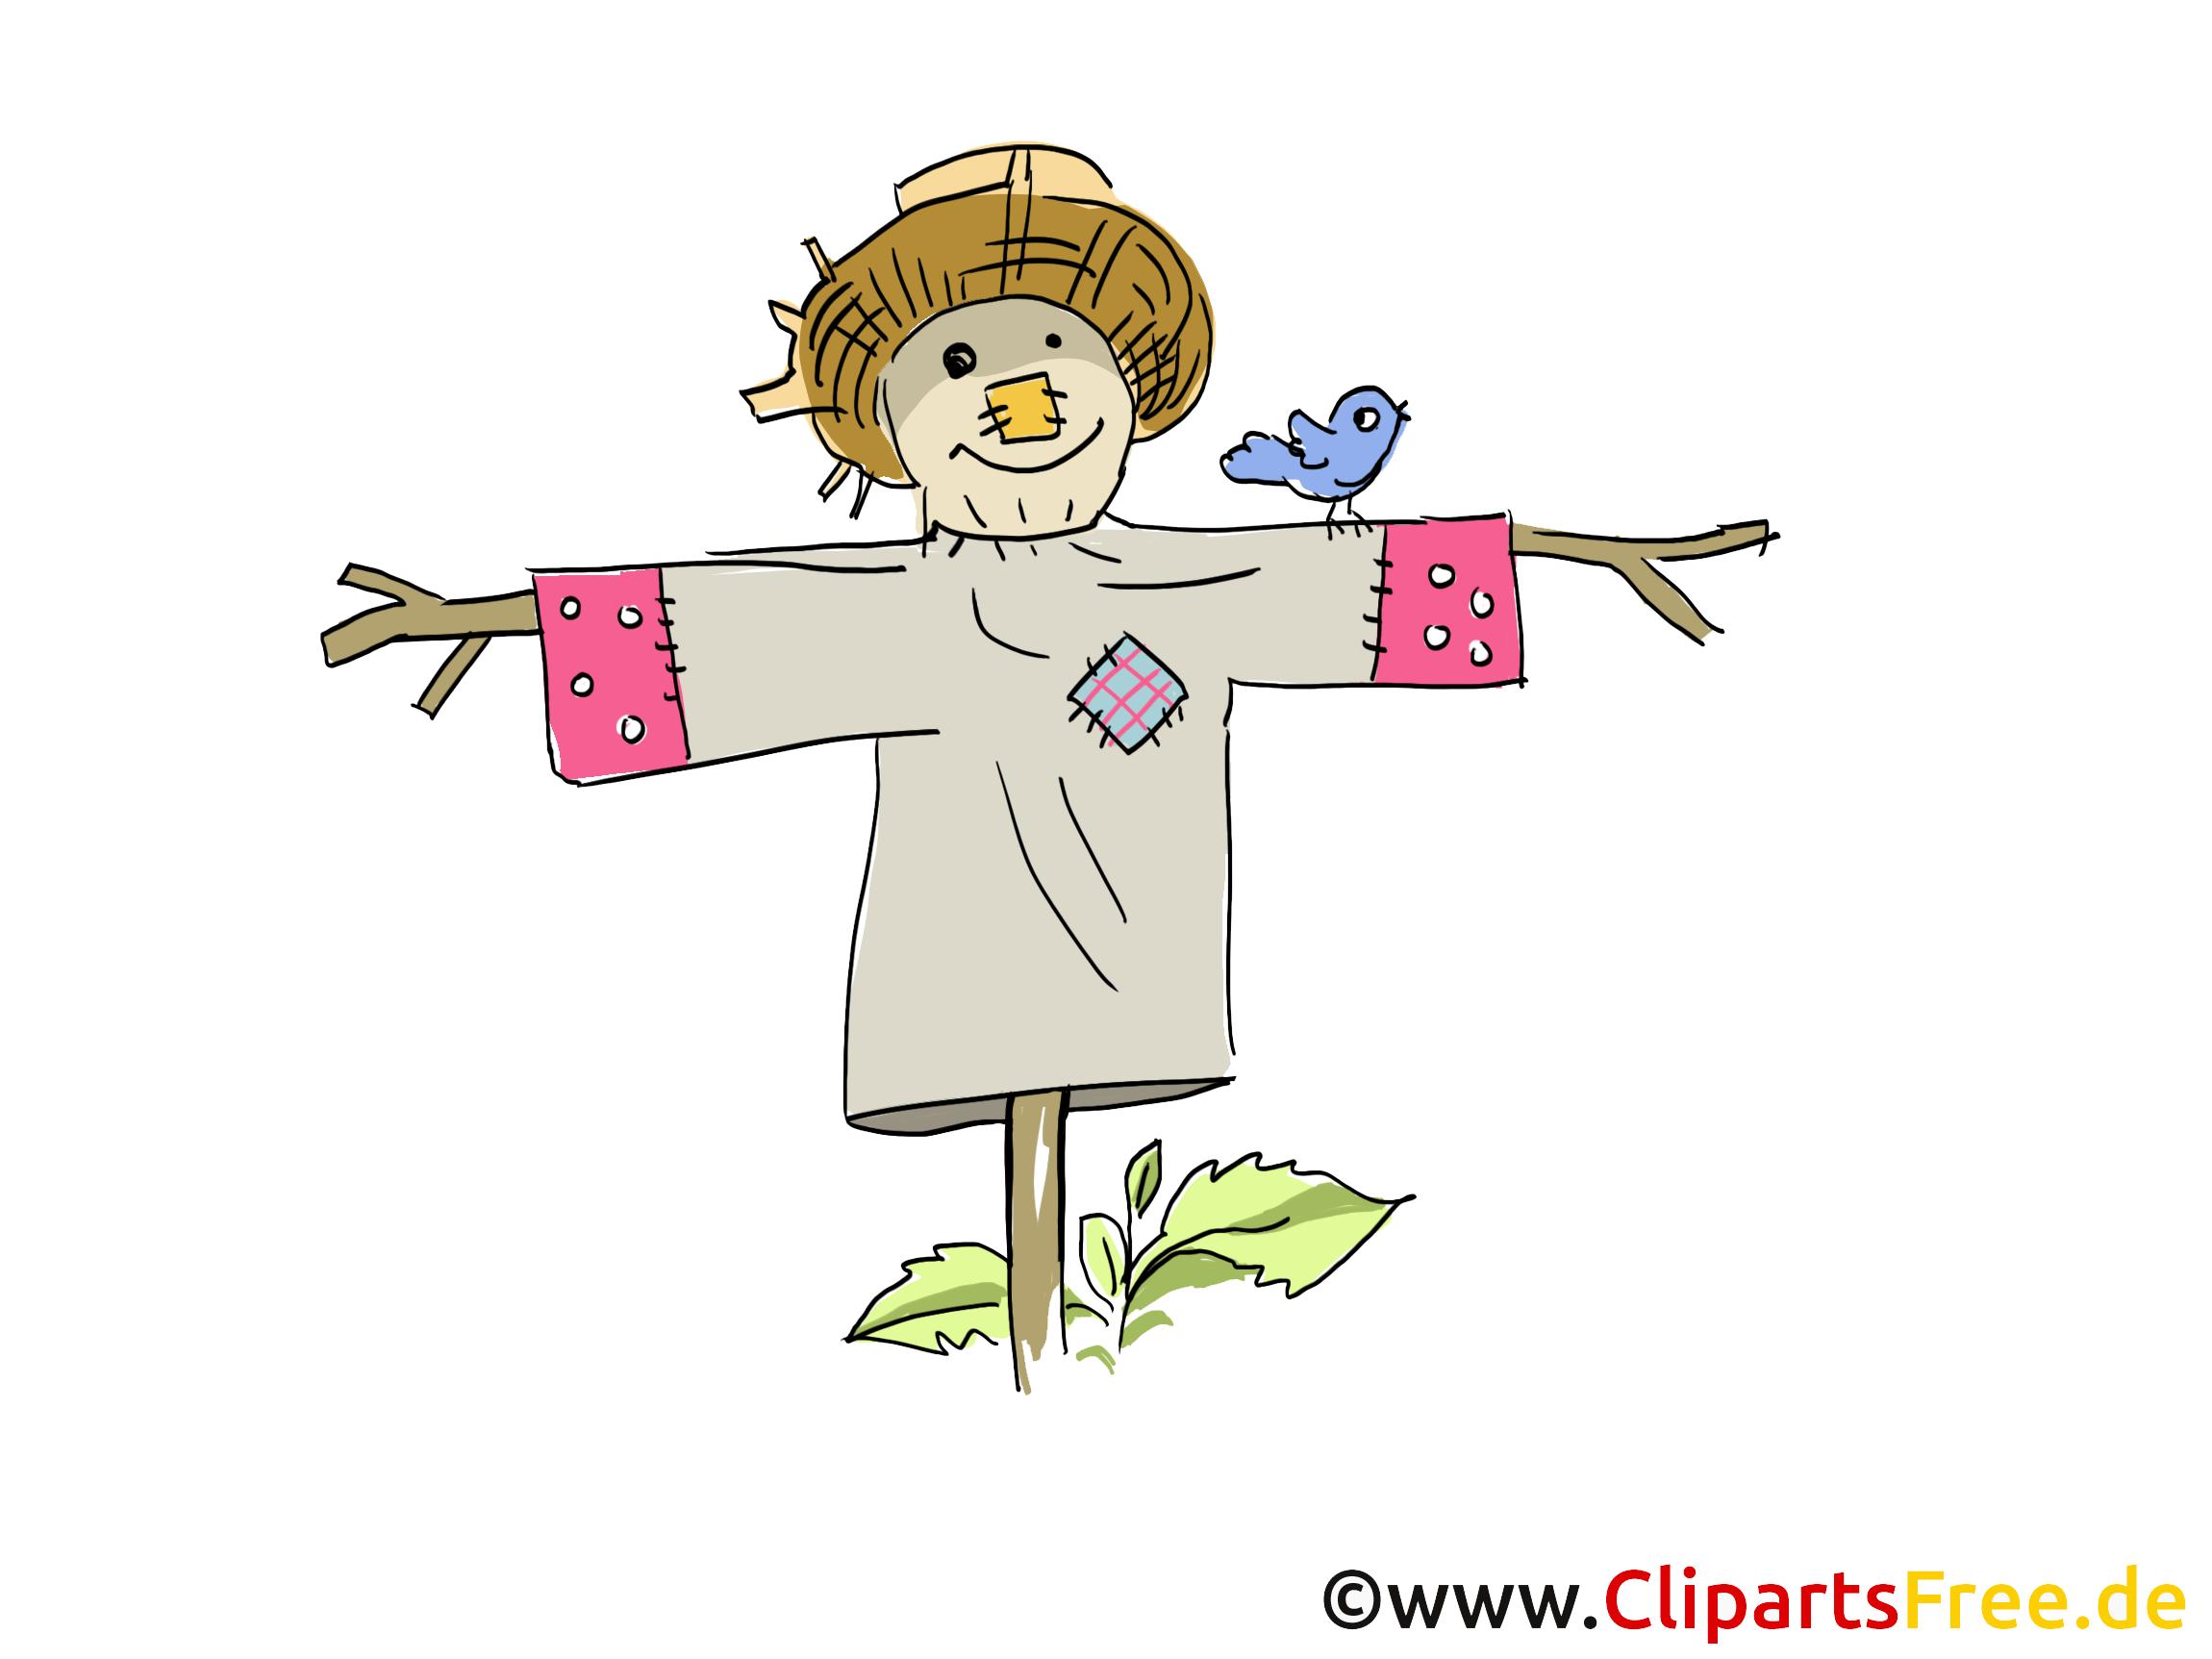 Popanz Bild, Clipart, Illustration, Grafik gratis